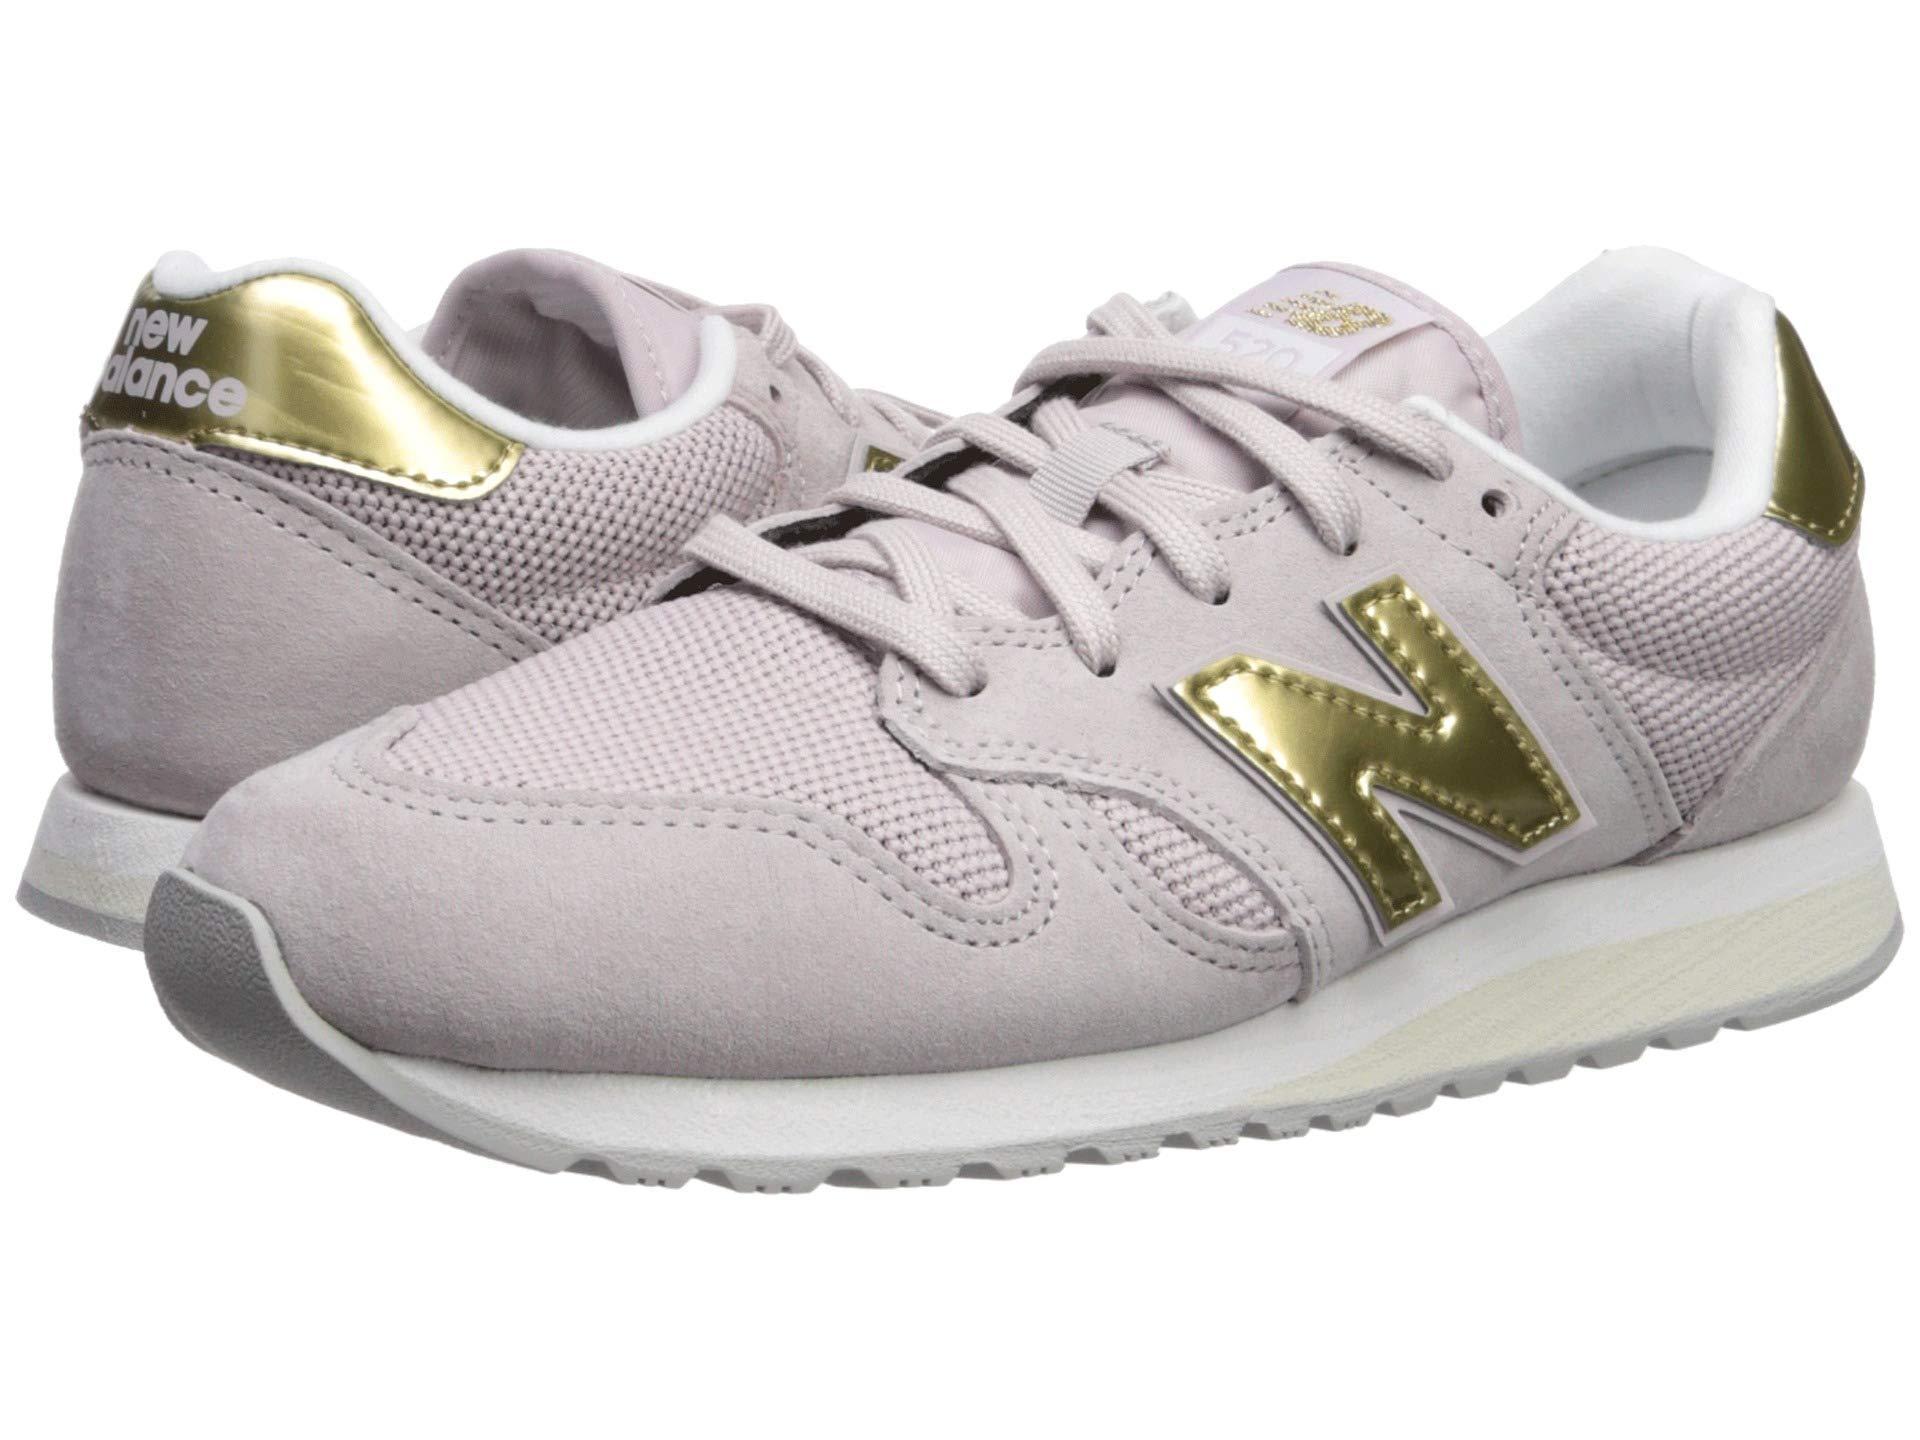 911bb8a29406 New Balance 5201-usa (black/classic Gold) Women's Shoes in Metallic ...